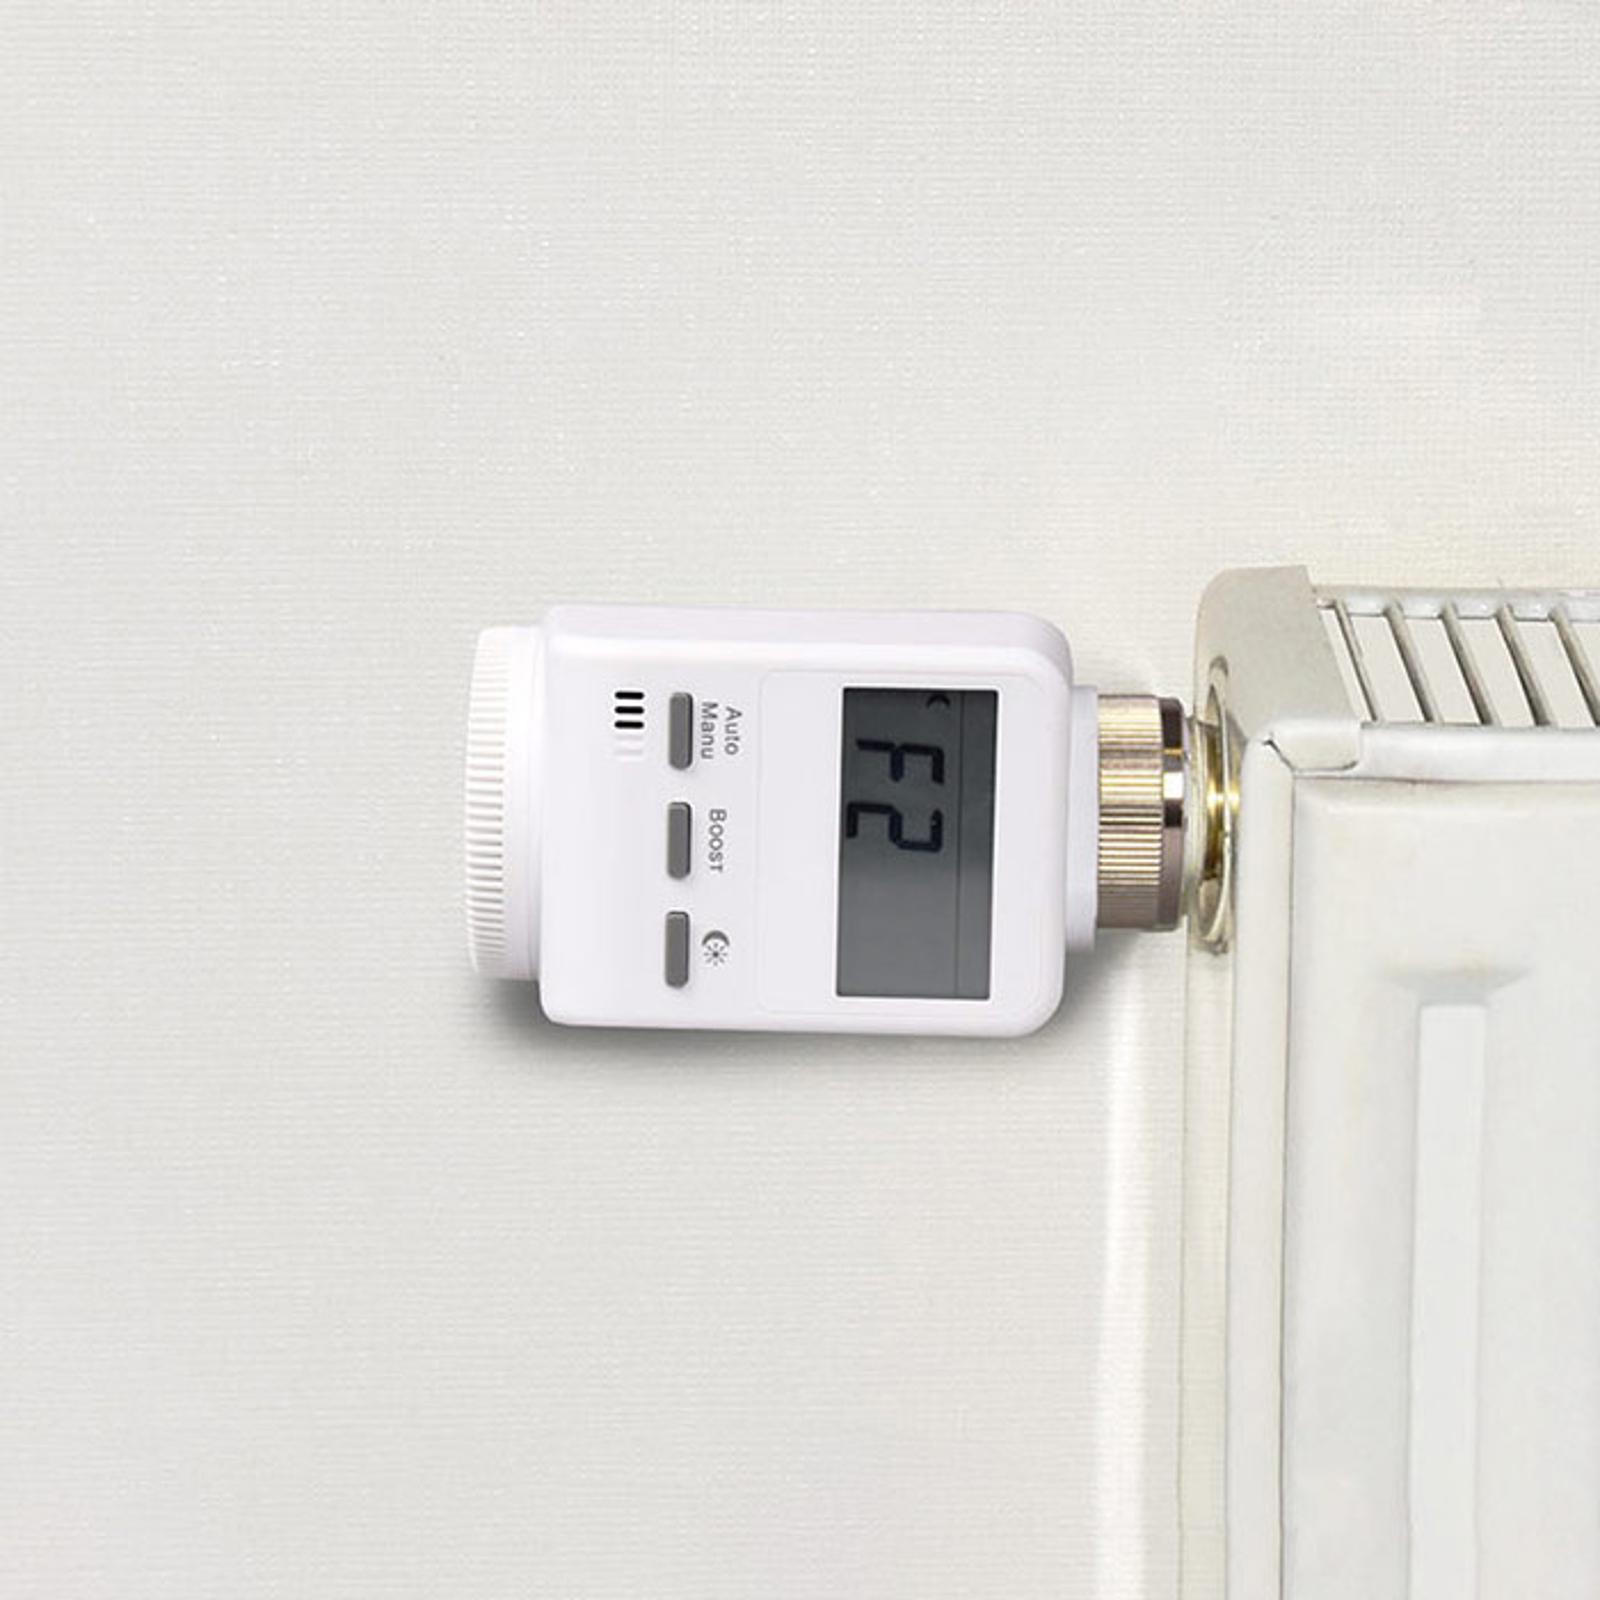 Blaupunkt TRV-S1 Heizkörper-Thermostat Q-Serie